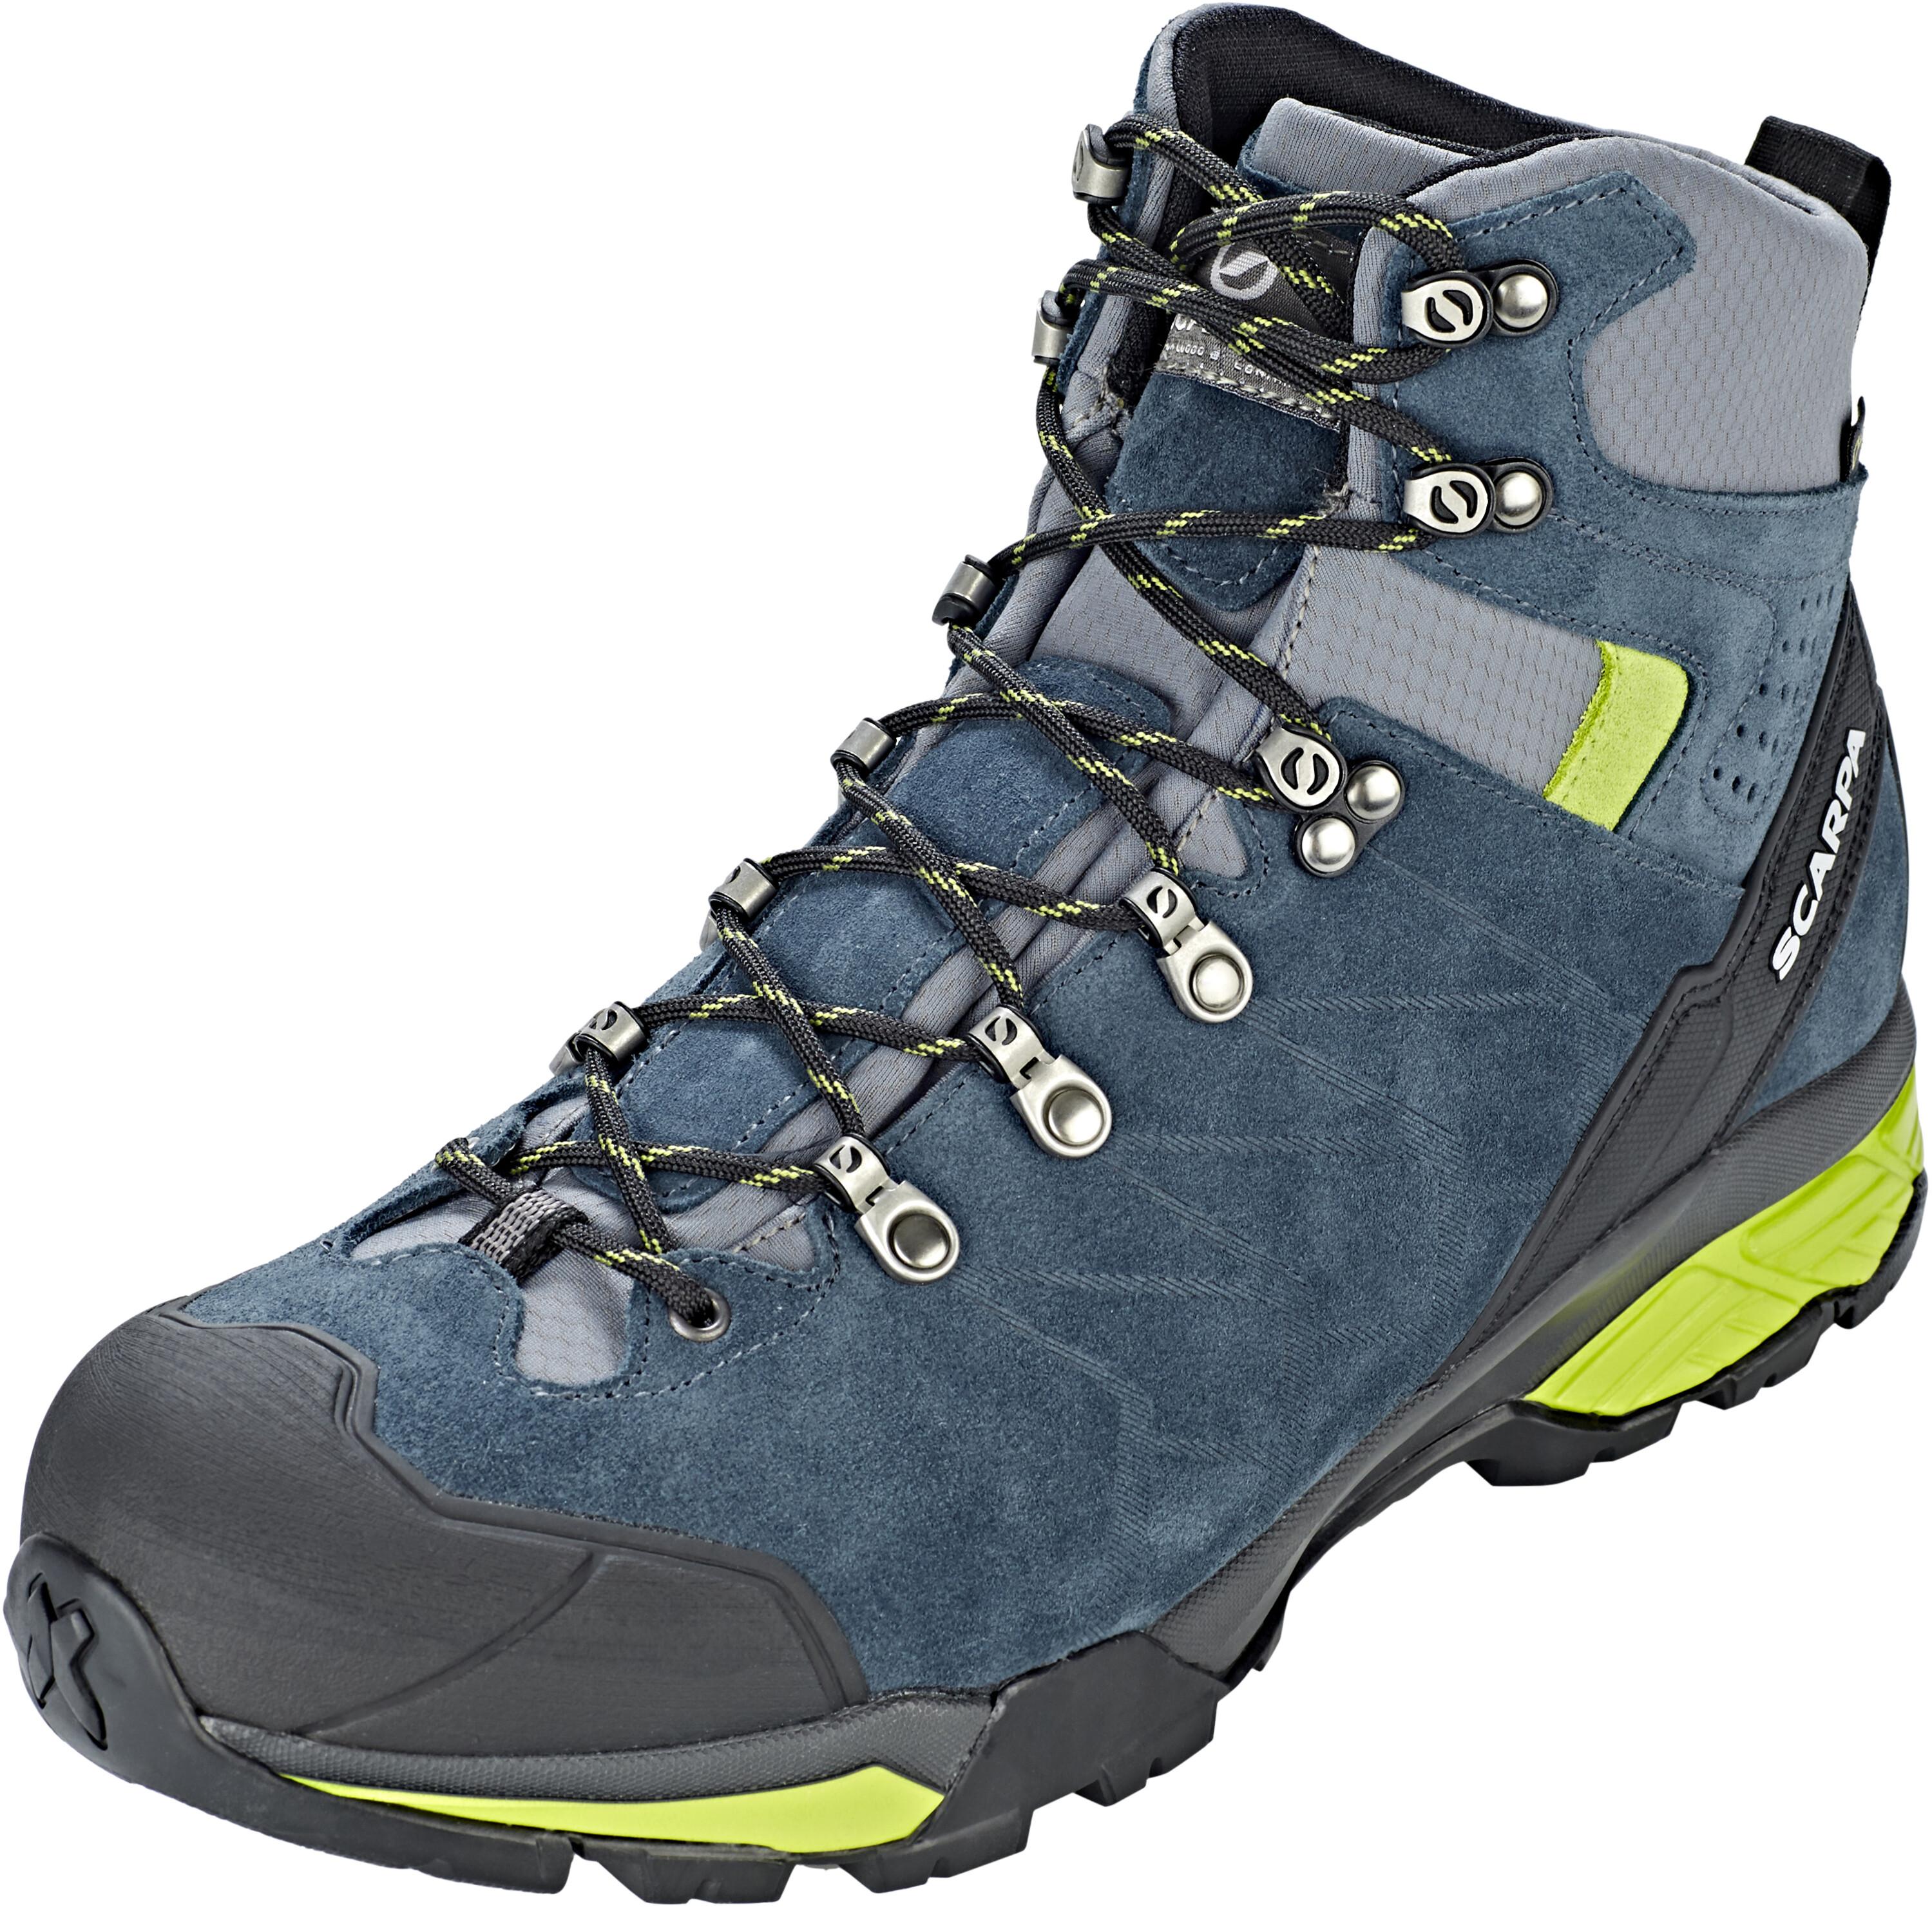 7eb40d60a Scarpa ZG Trek GTX Shoes Men ottanio/spring at Addnature.co.uk